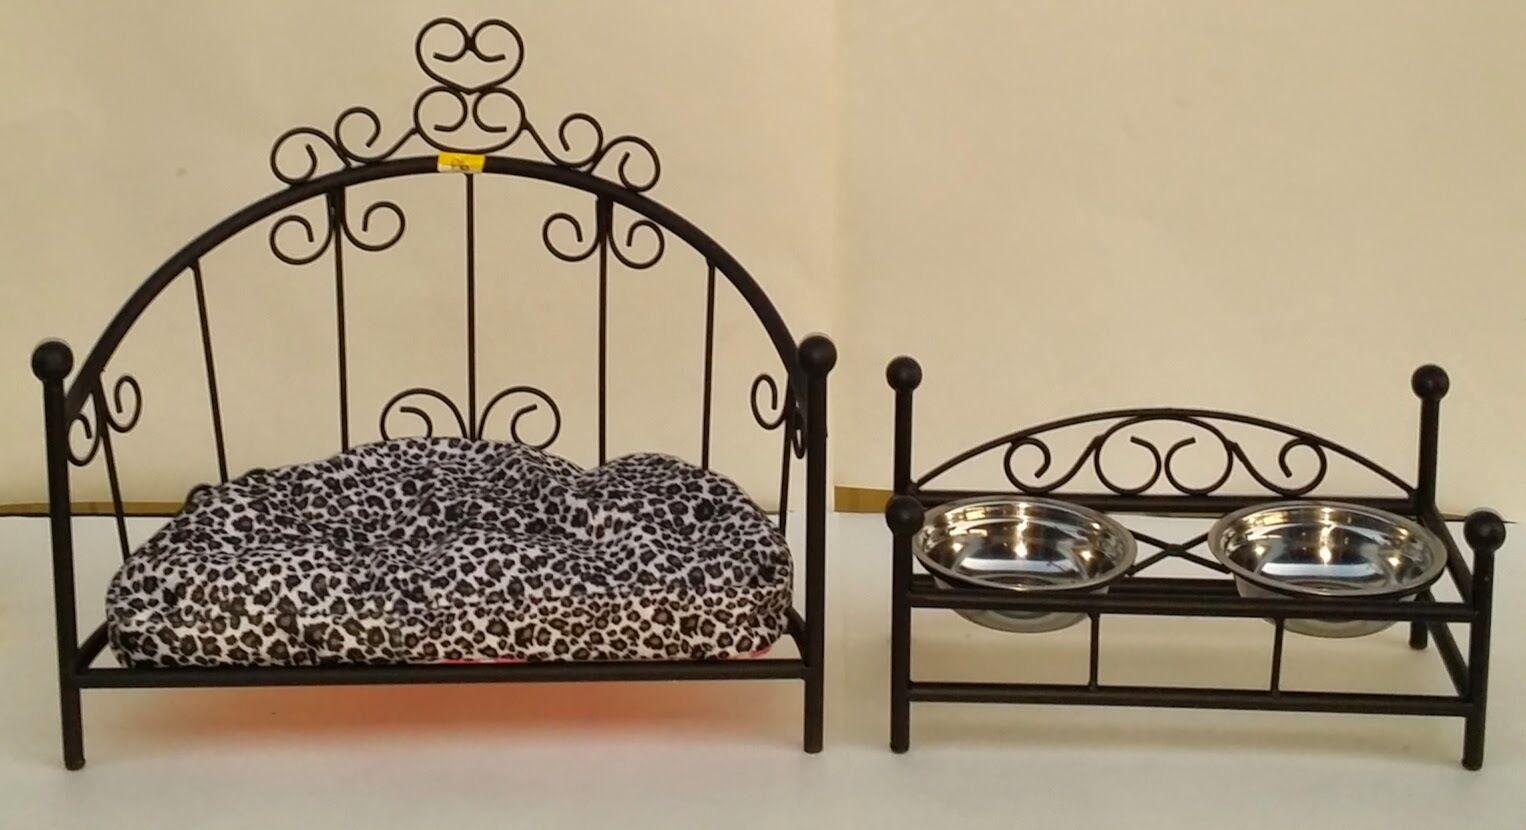 Sconto del 60% Custom-made Wrought Iron Iron Iron Dog Cat Pet Bed & Feeder  punto vendita